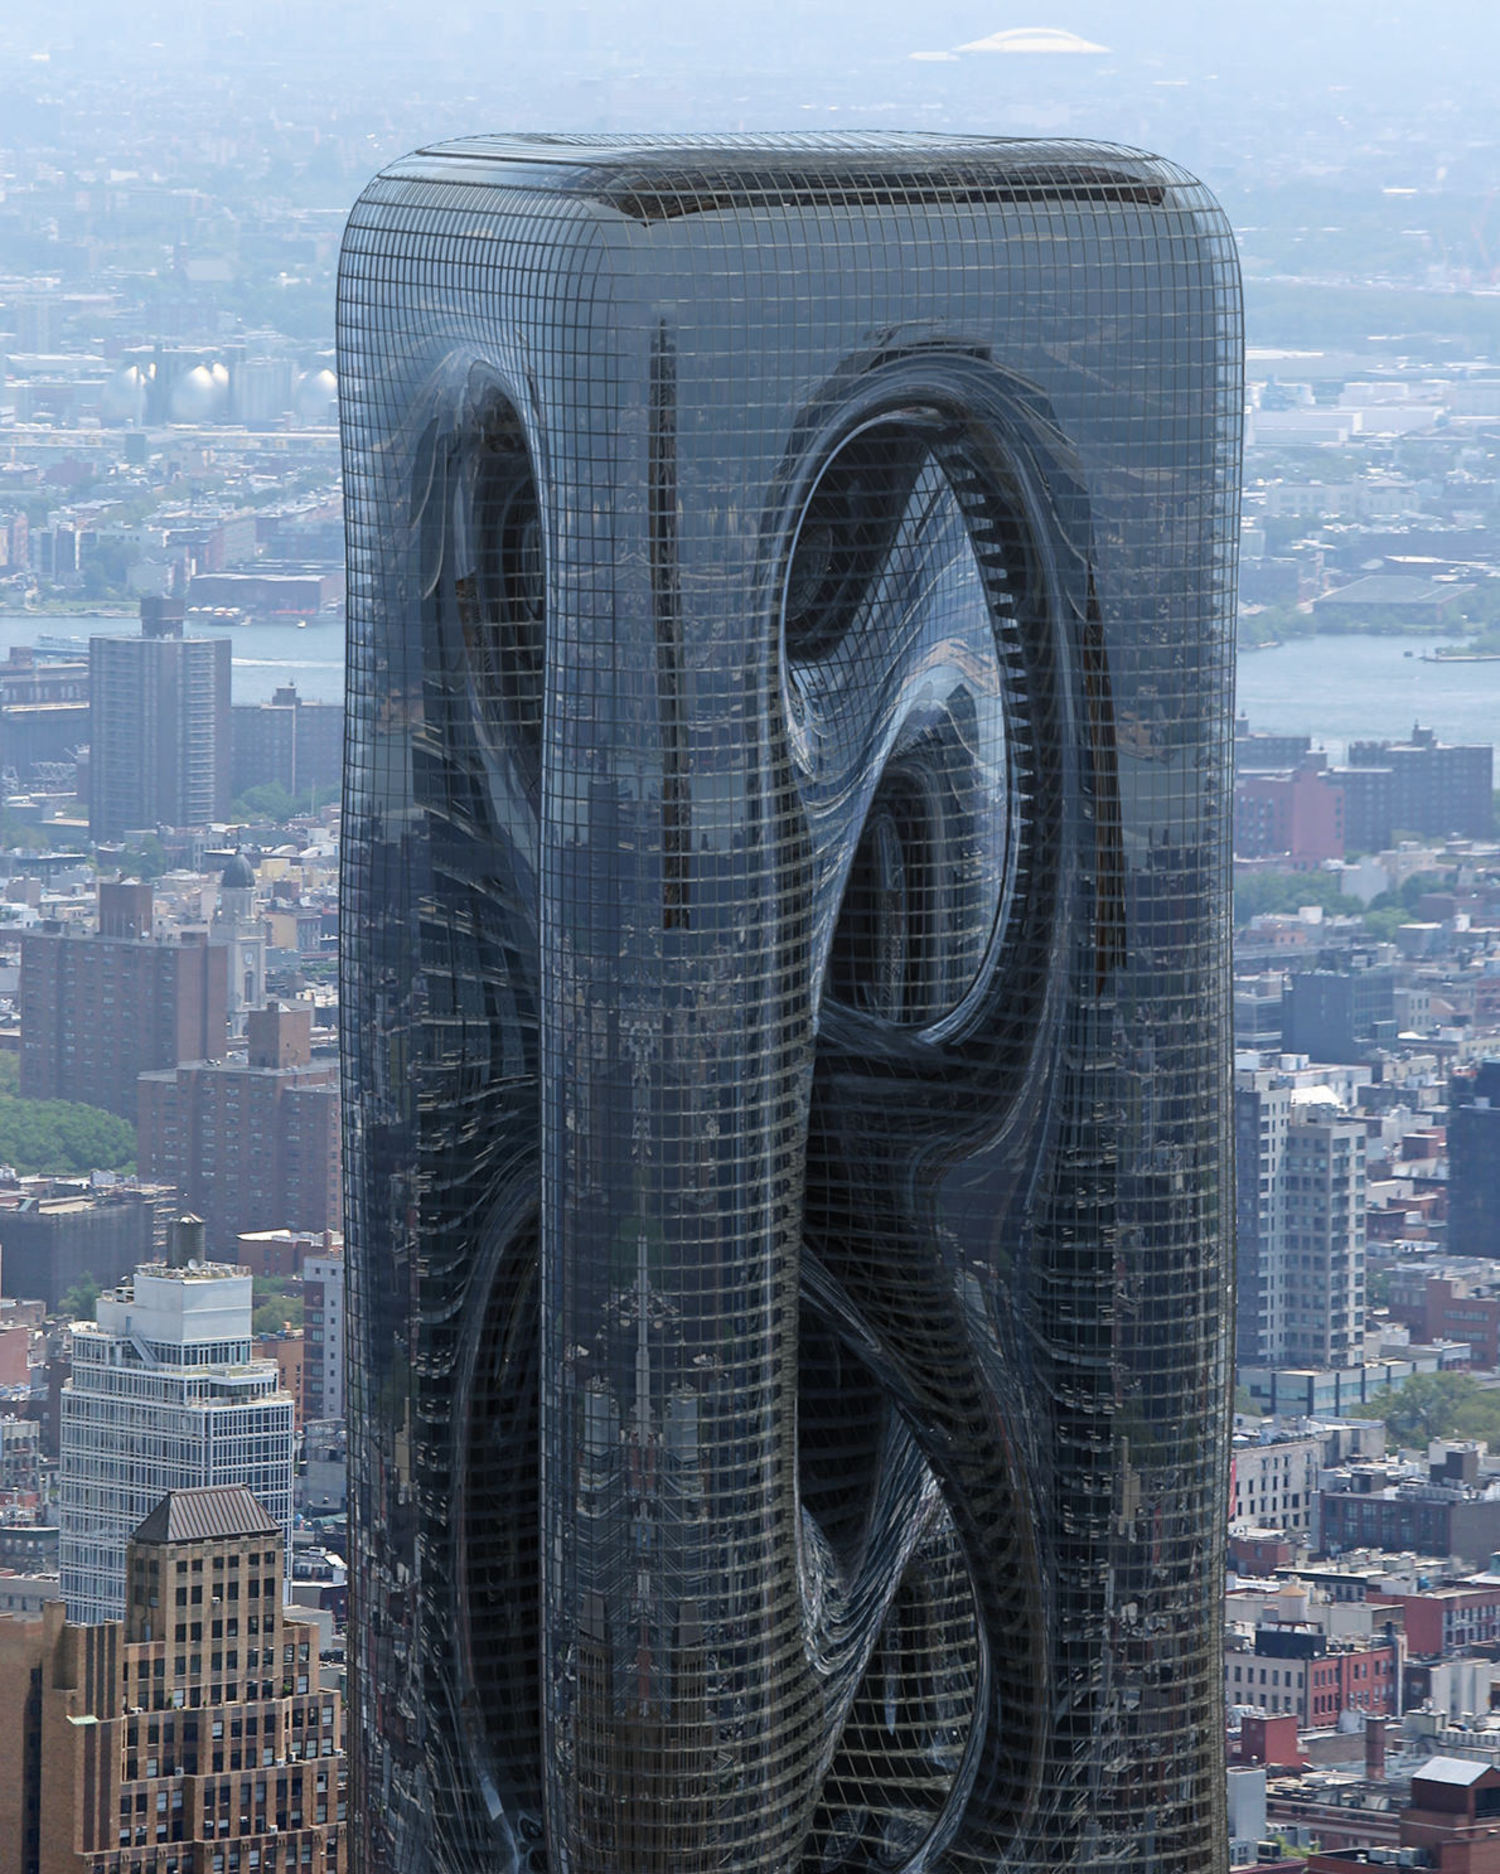 Sarcostyle Tower, Rendering, Hayri Atak Architectural Design Studio